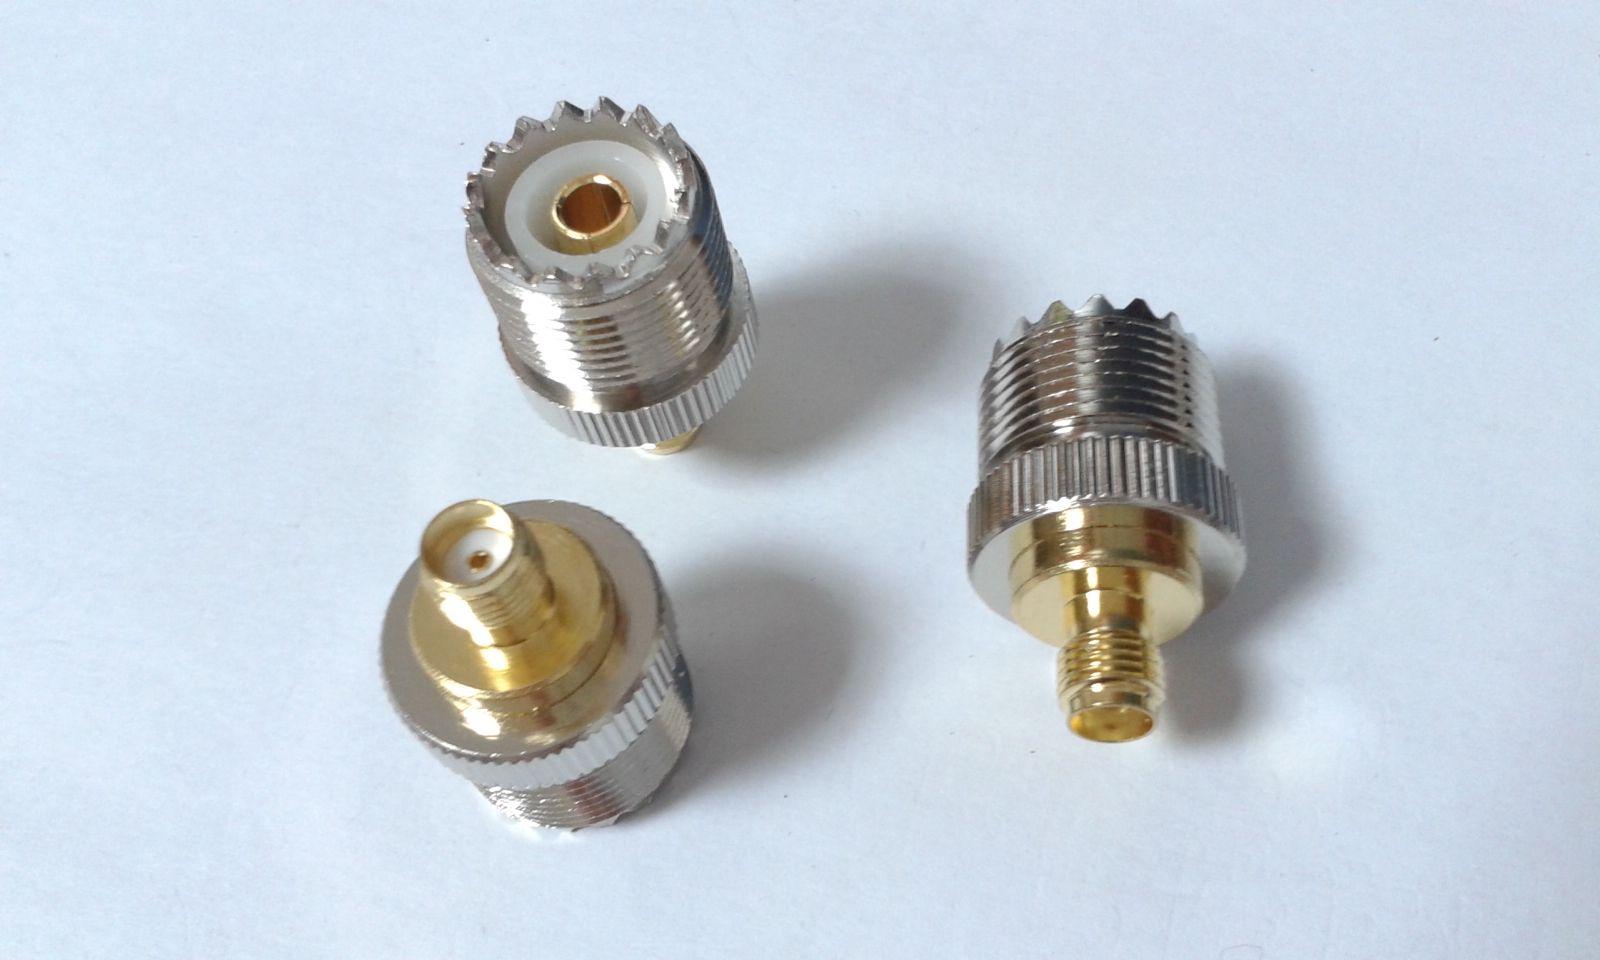 UHF أنثى SO-239 جاك إلى SMA أنثى جاك RF موصل محول مستقيم